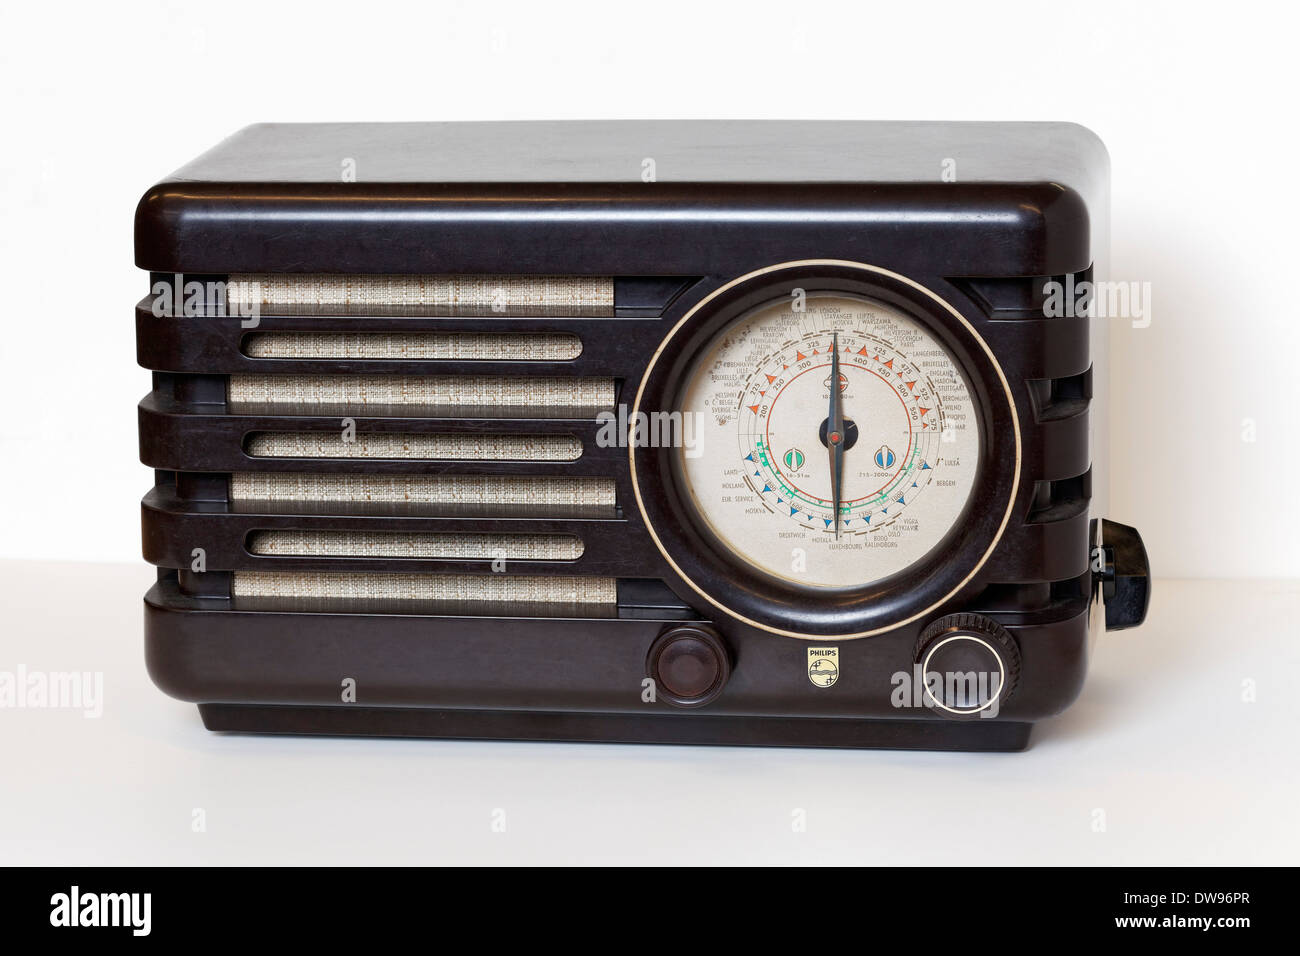 Philips LO5L, radio from 1947, Bakelite housing, Radio Museum Duisburg, North Rhine-Westphalia, Germany - Stock Image